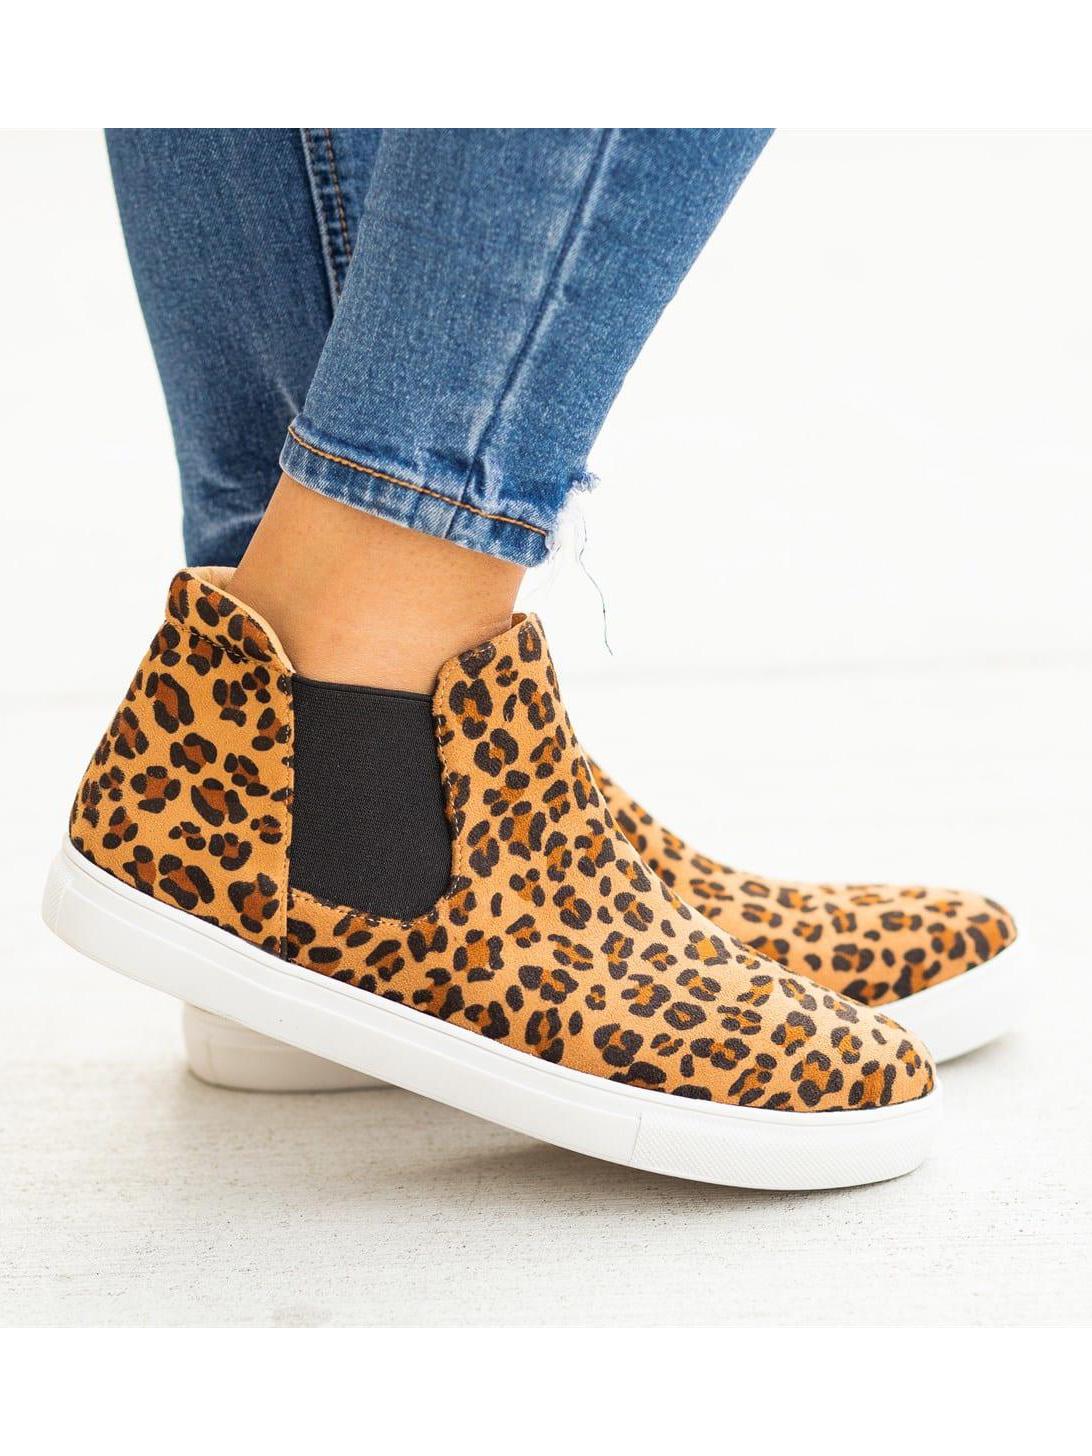 Fshion Animal Printed Slip On Shoes